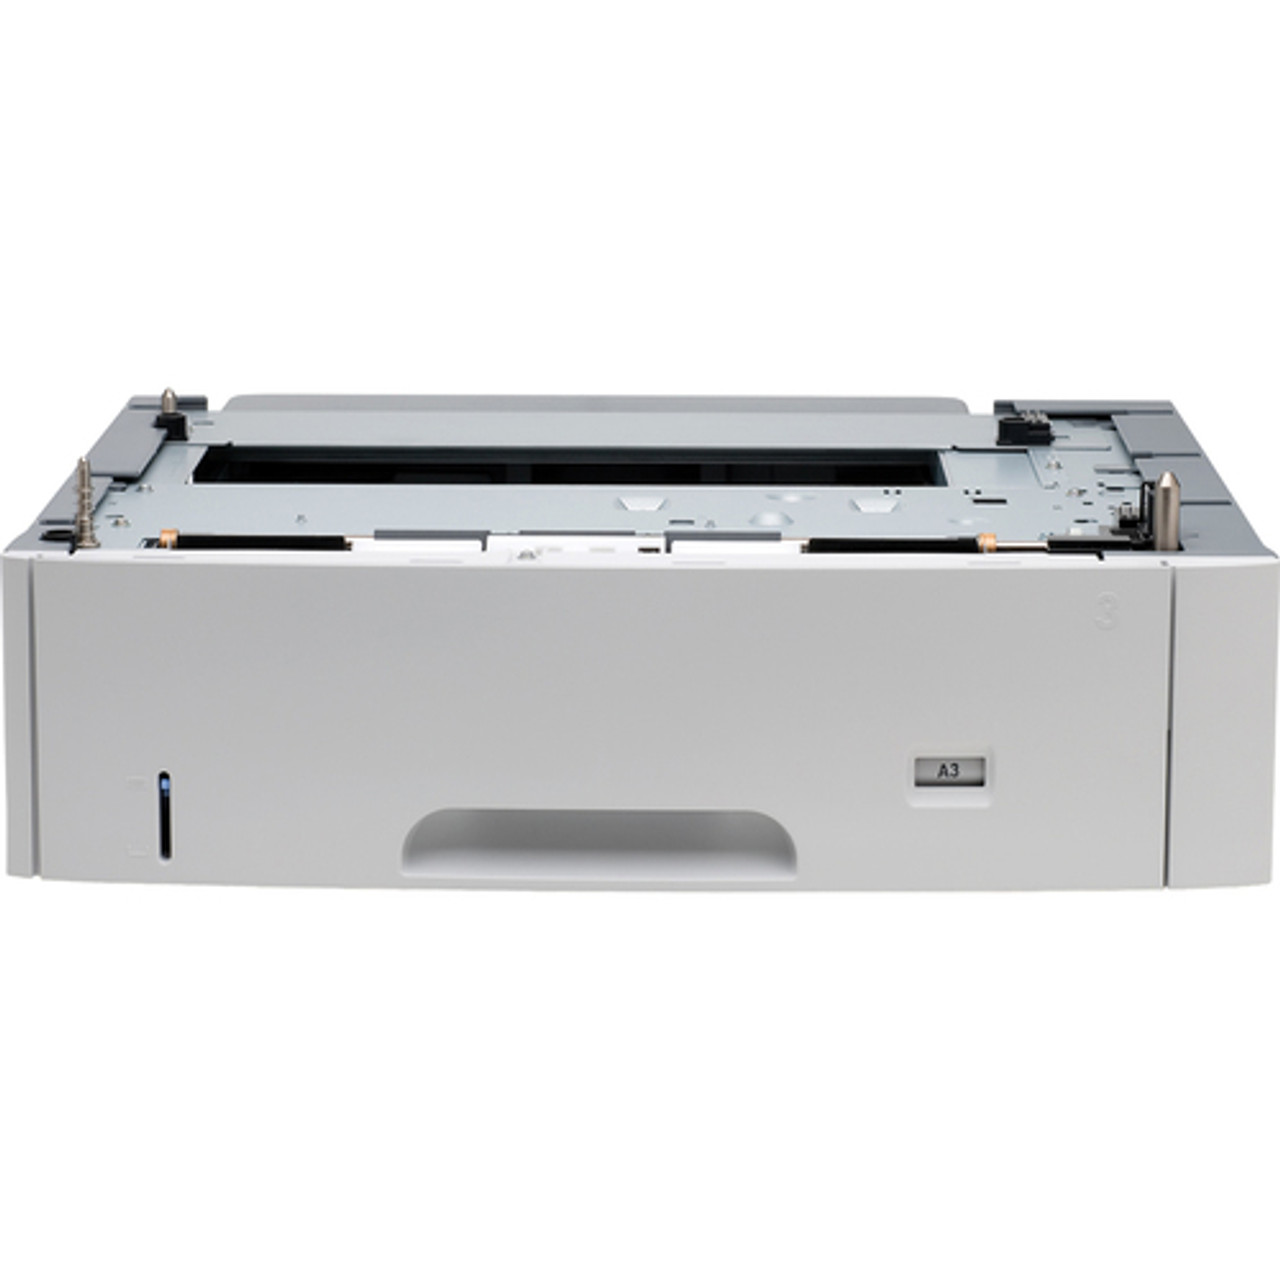 500 Sheet Optional Tray for HP LaserJet 5200